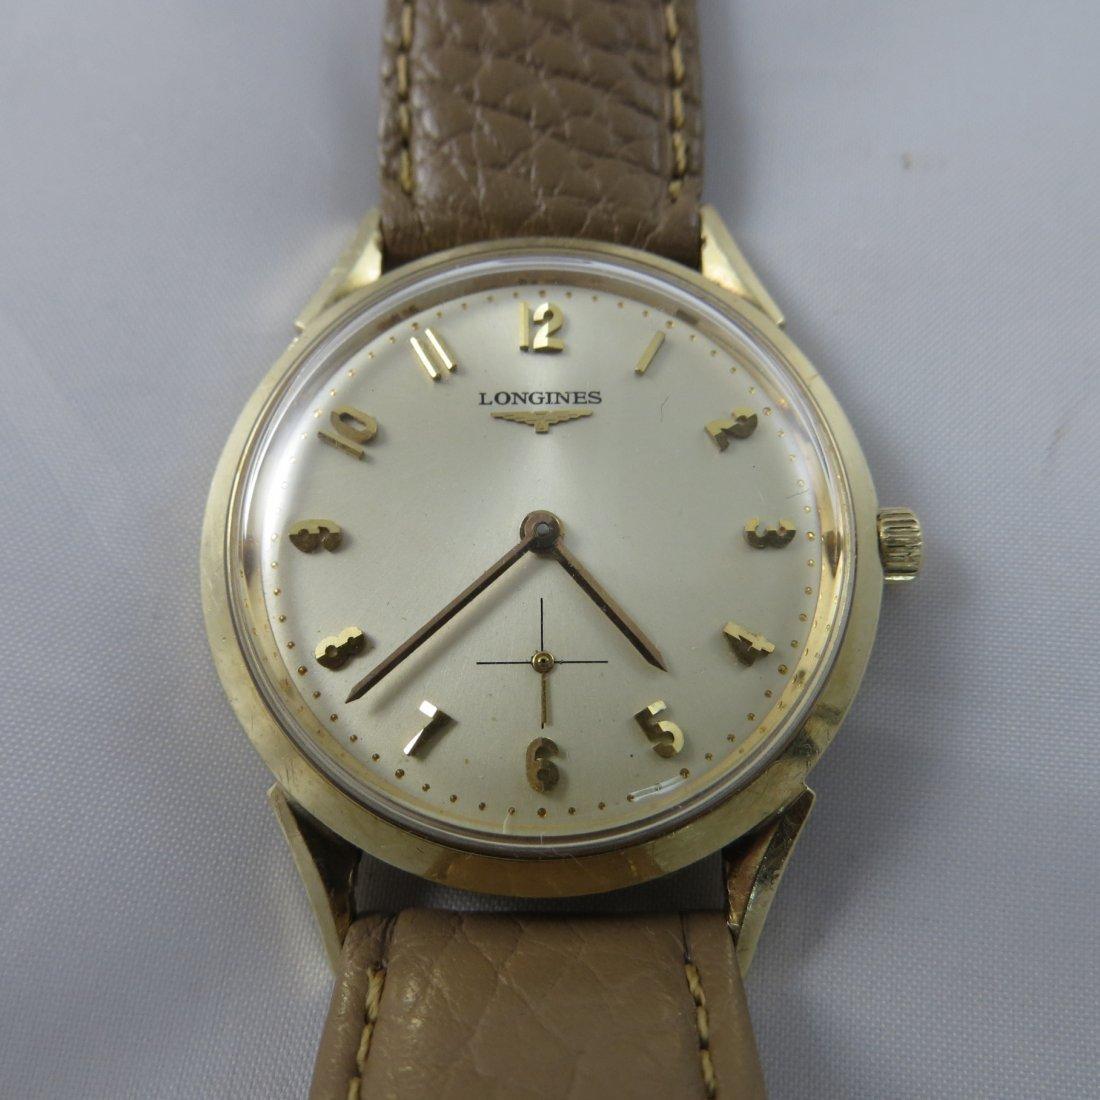 14K Yellow Gold Longines Watch